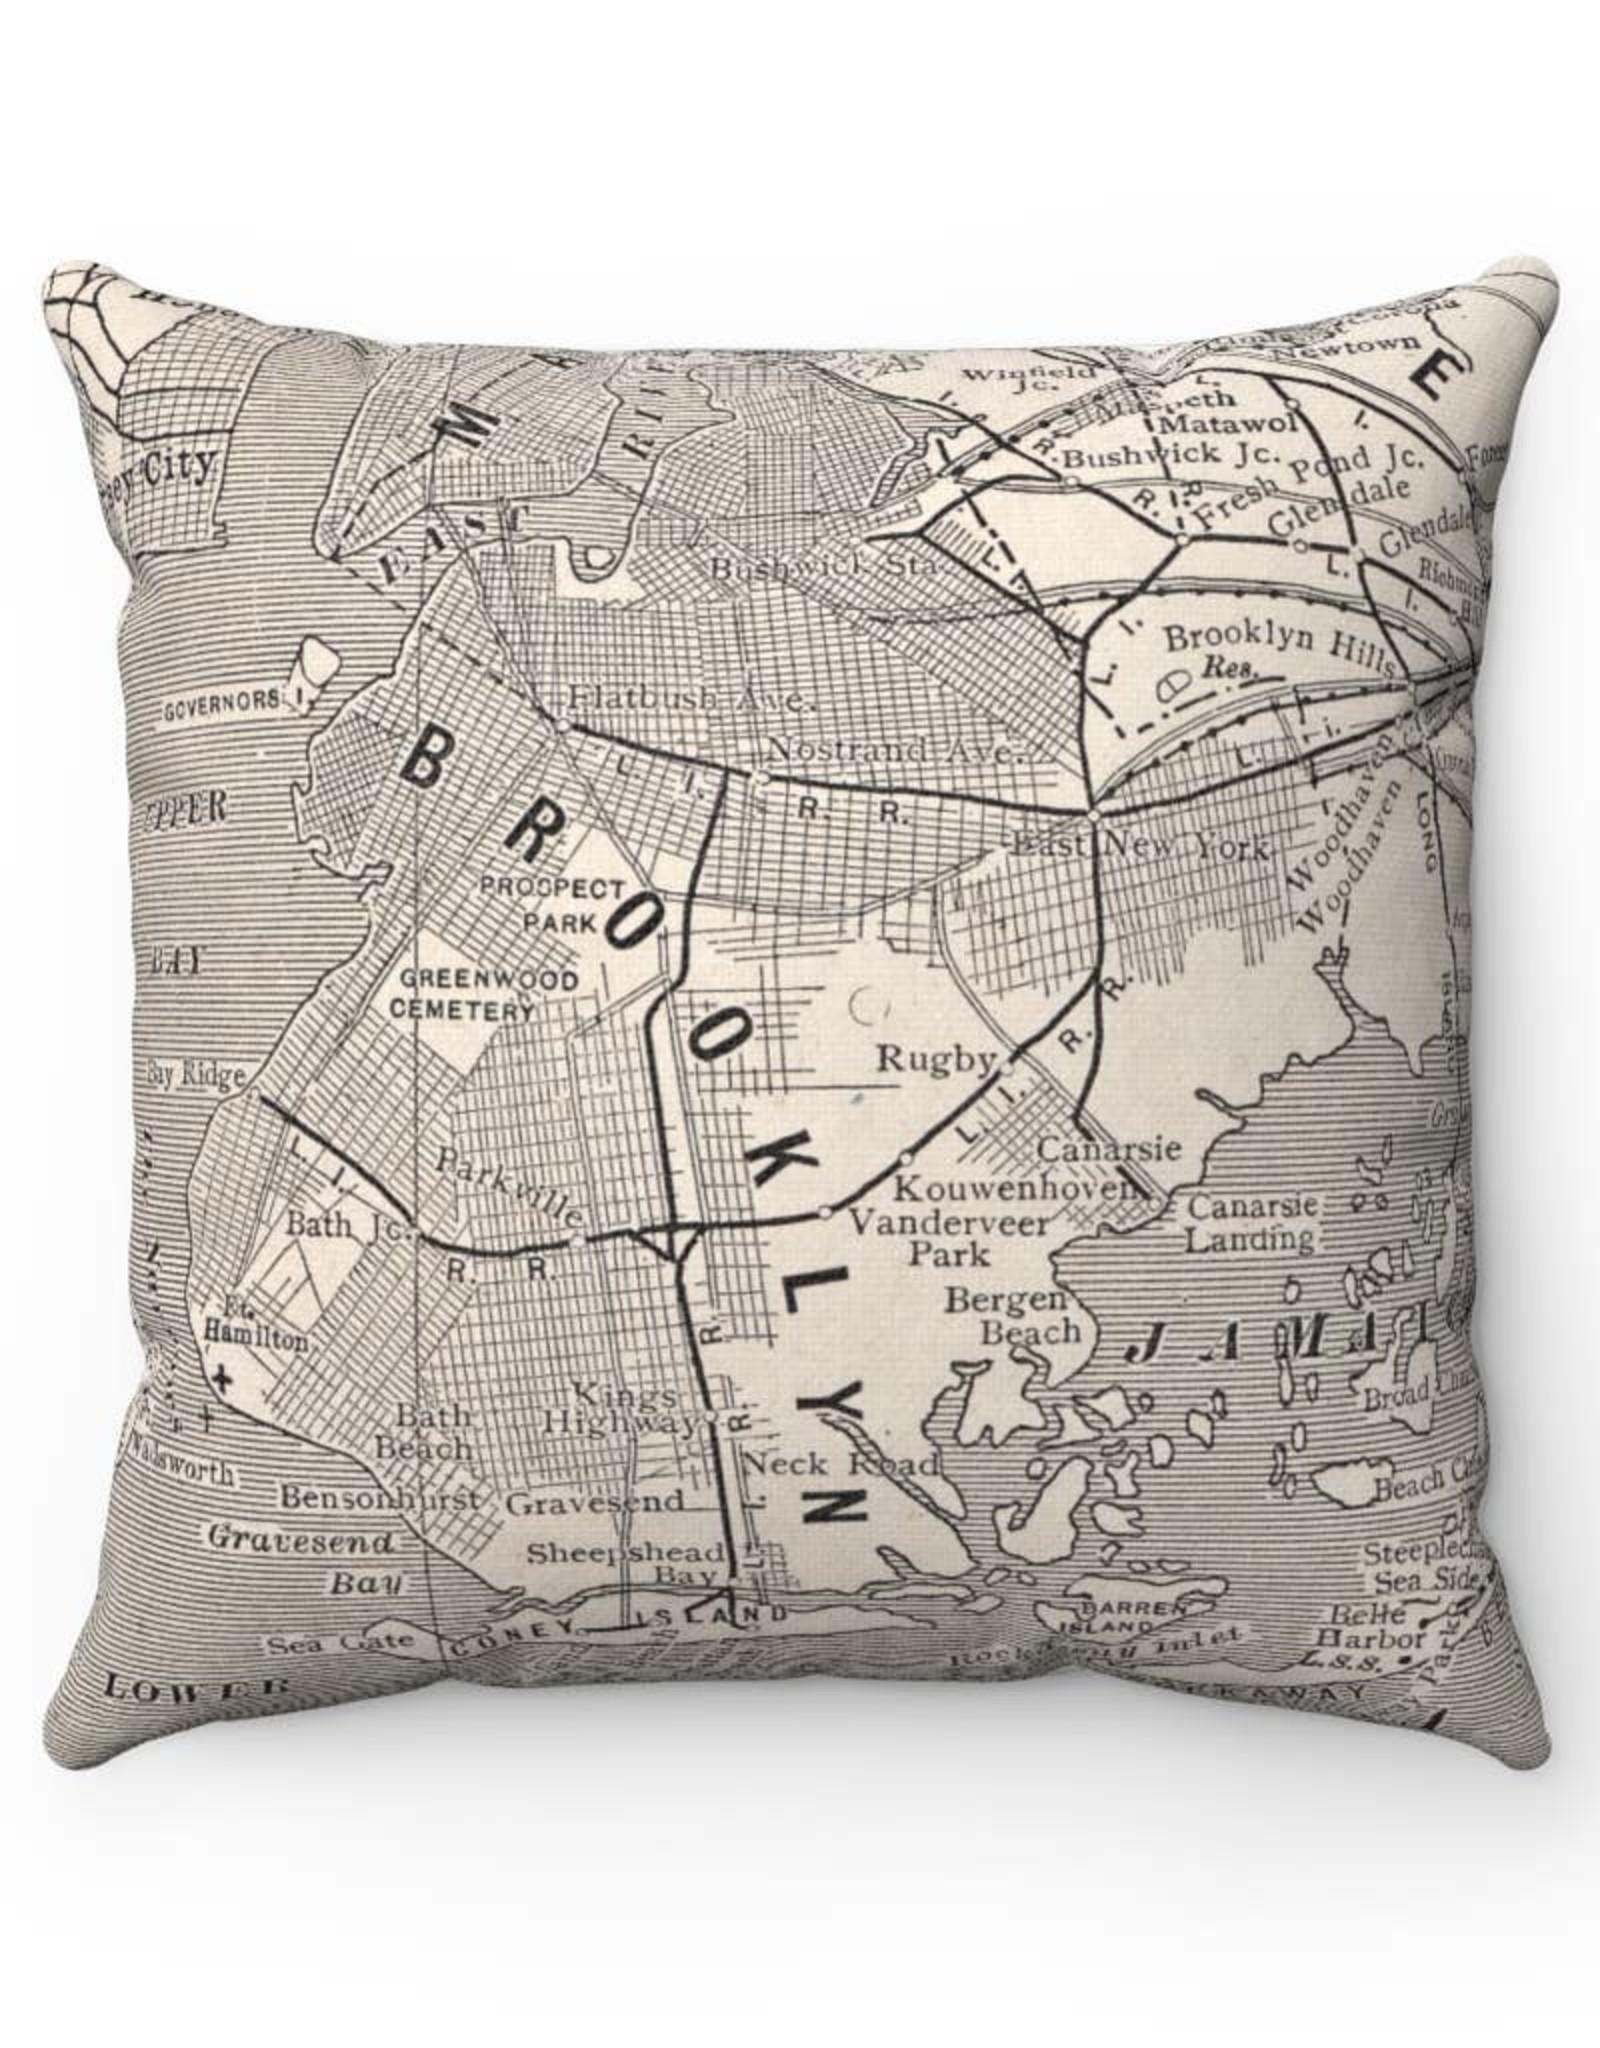 Daisy Mae Designs Brooklyn Black & White Map Pillow